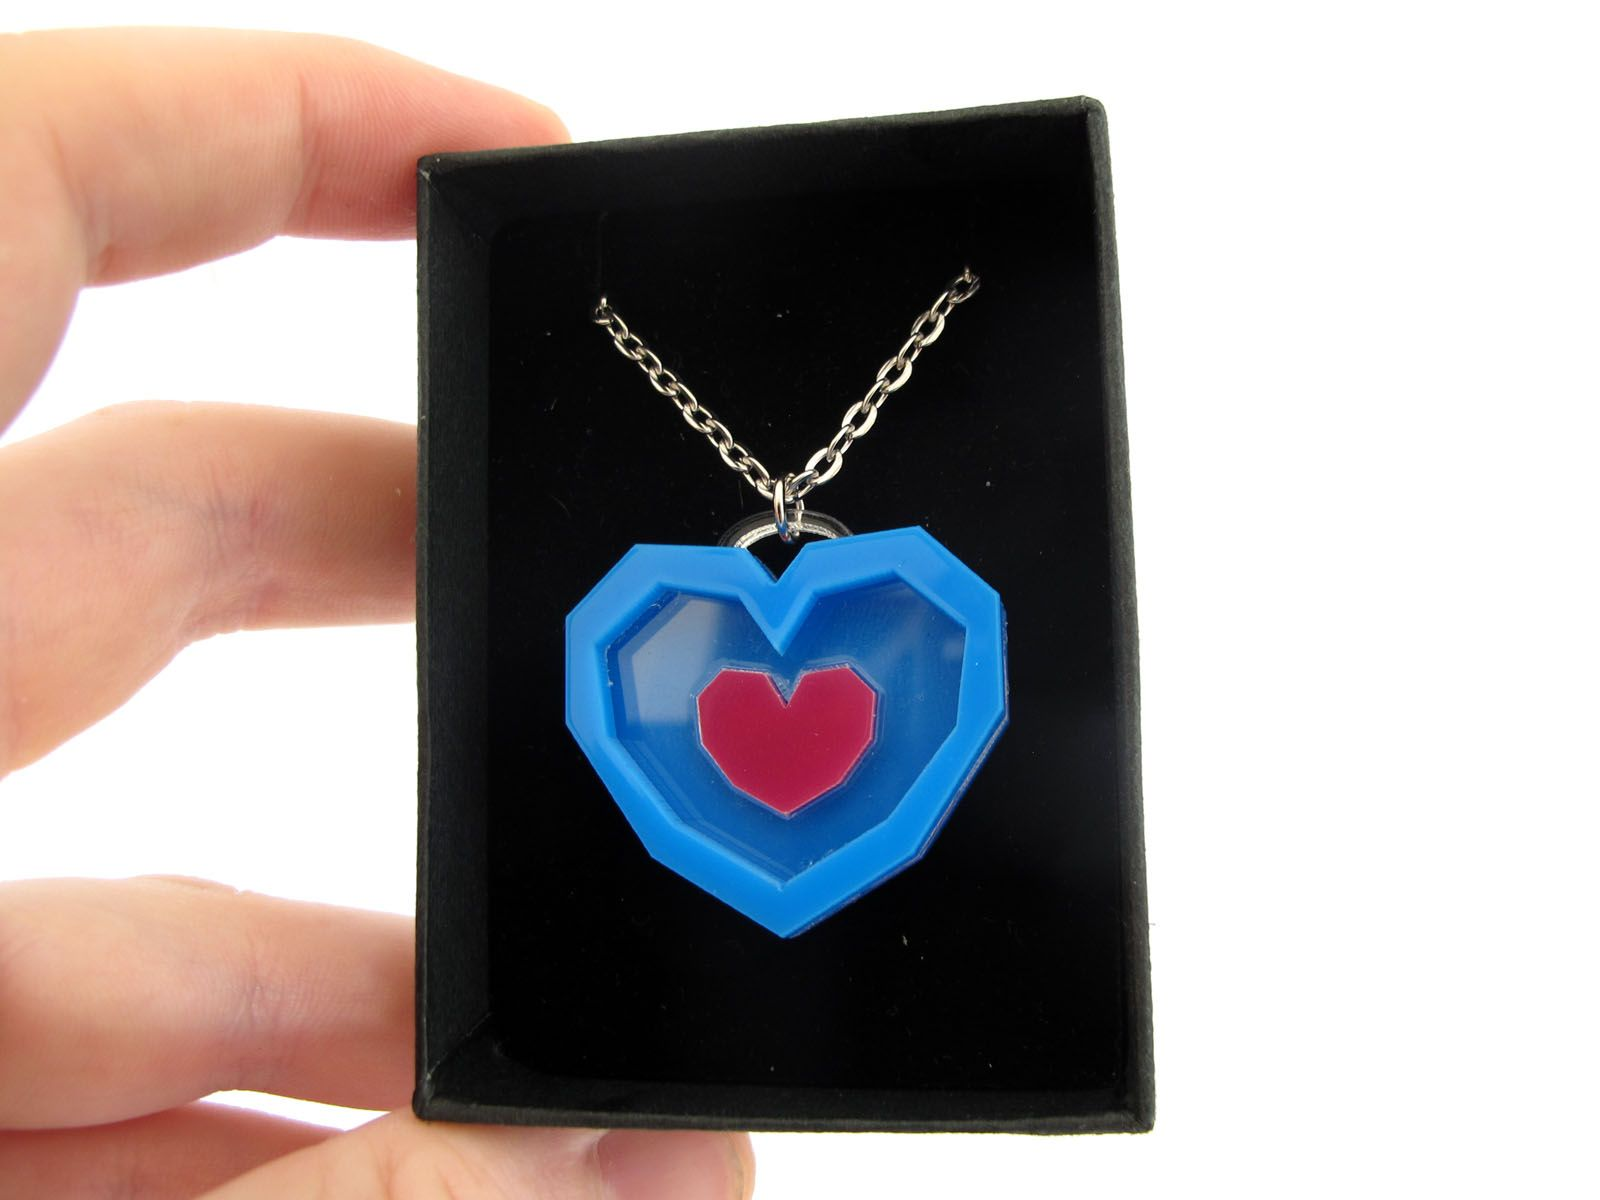 Zelda Piece of Heart by milkool.deviantart.com on @DeviantArt